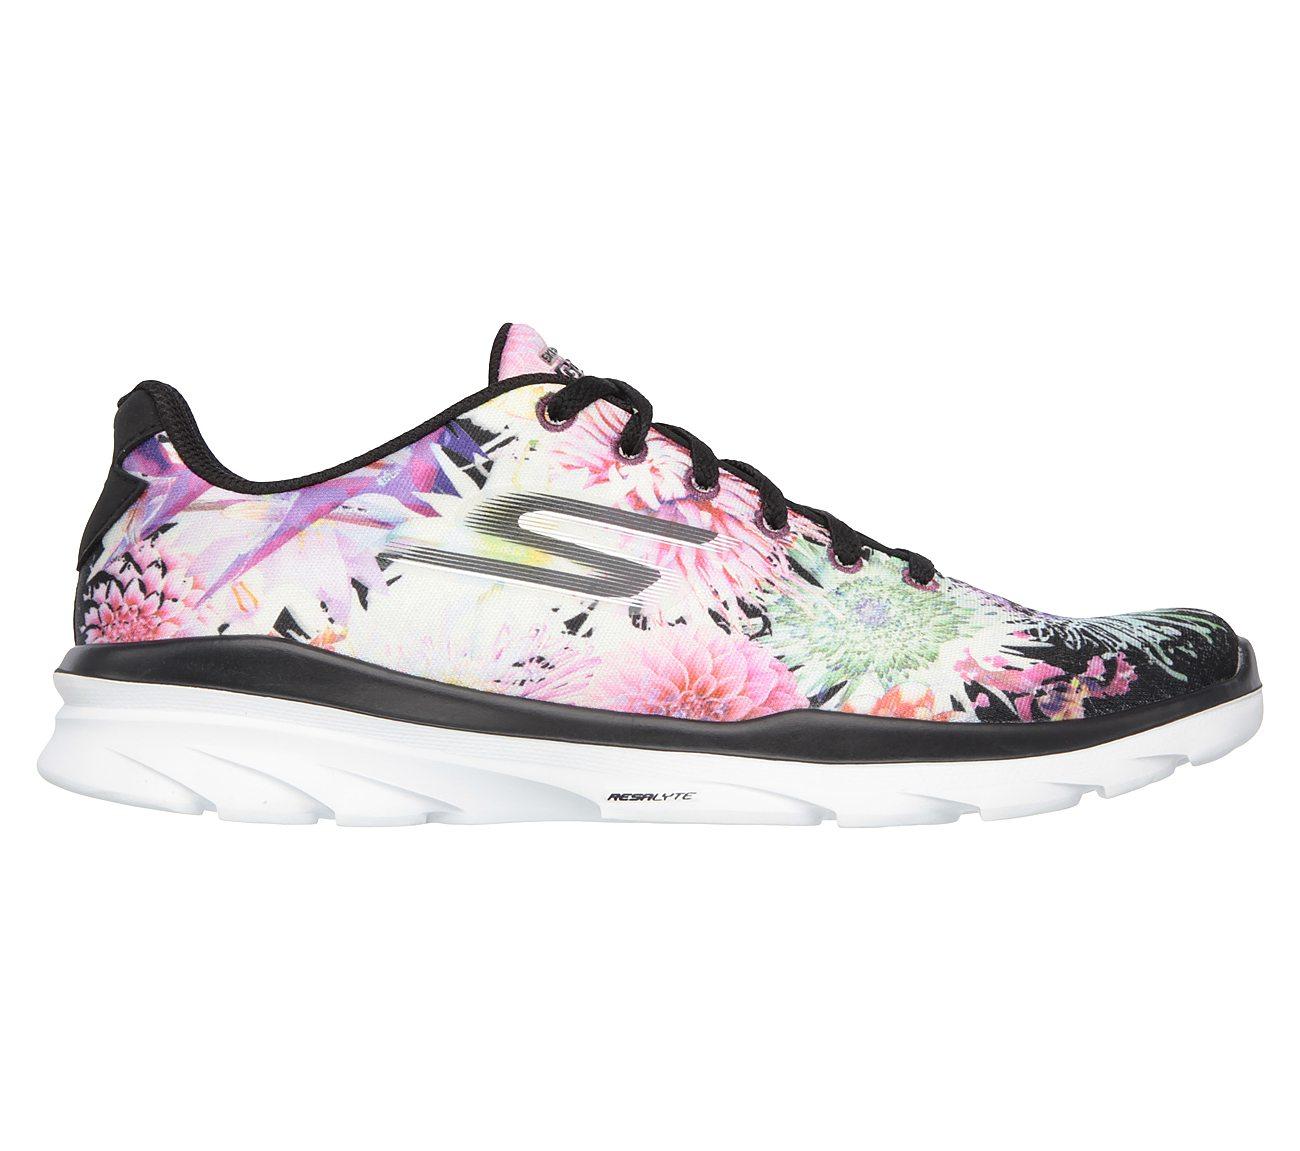 SKECHERS Women's GOfit Bay Rose Training Shoes